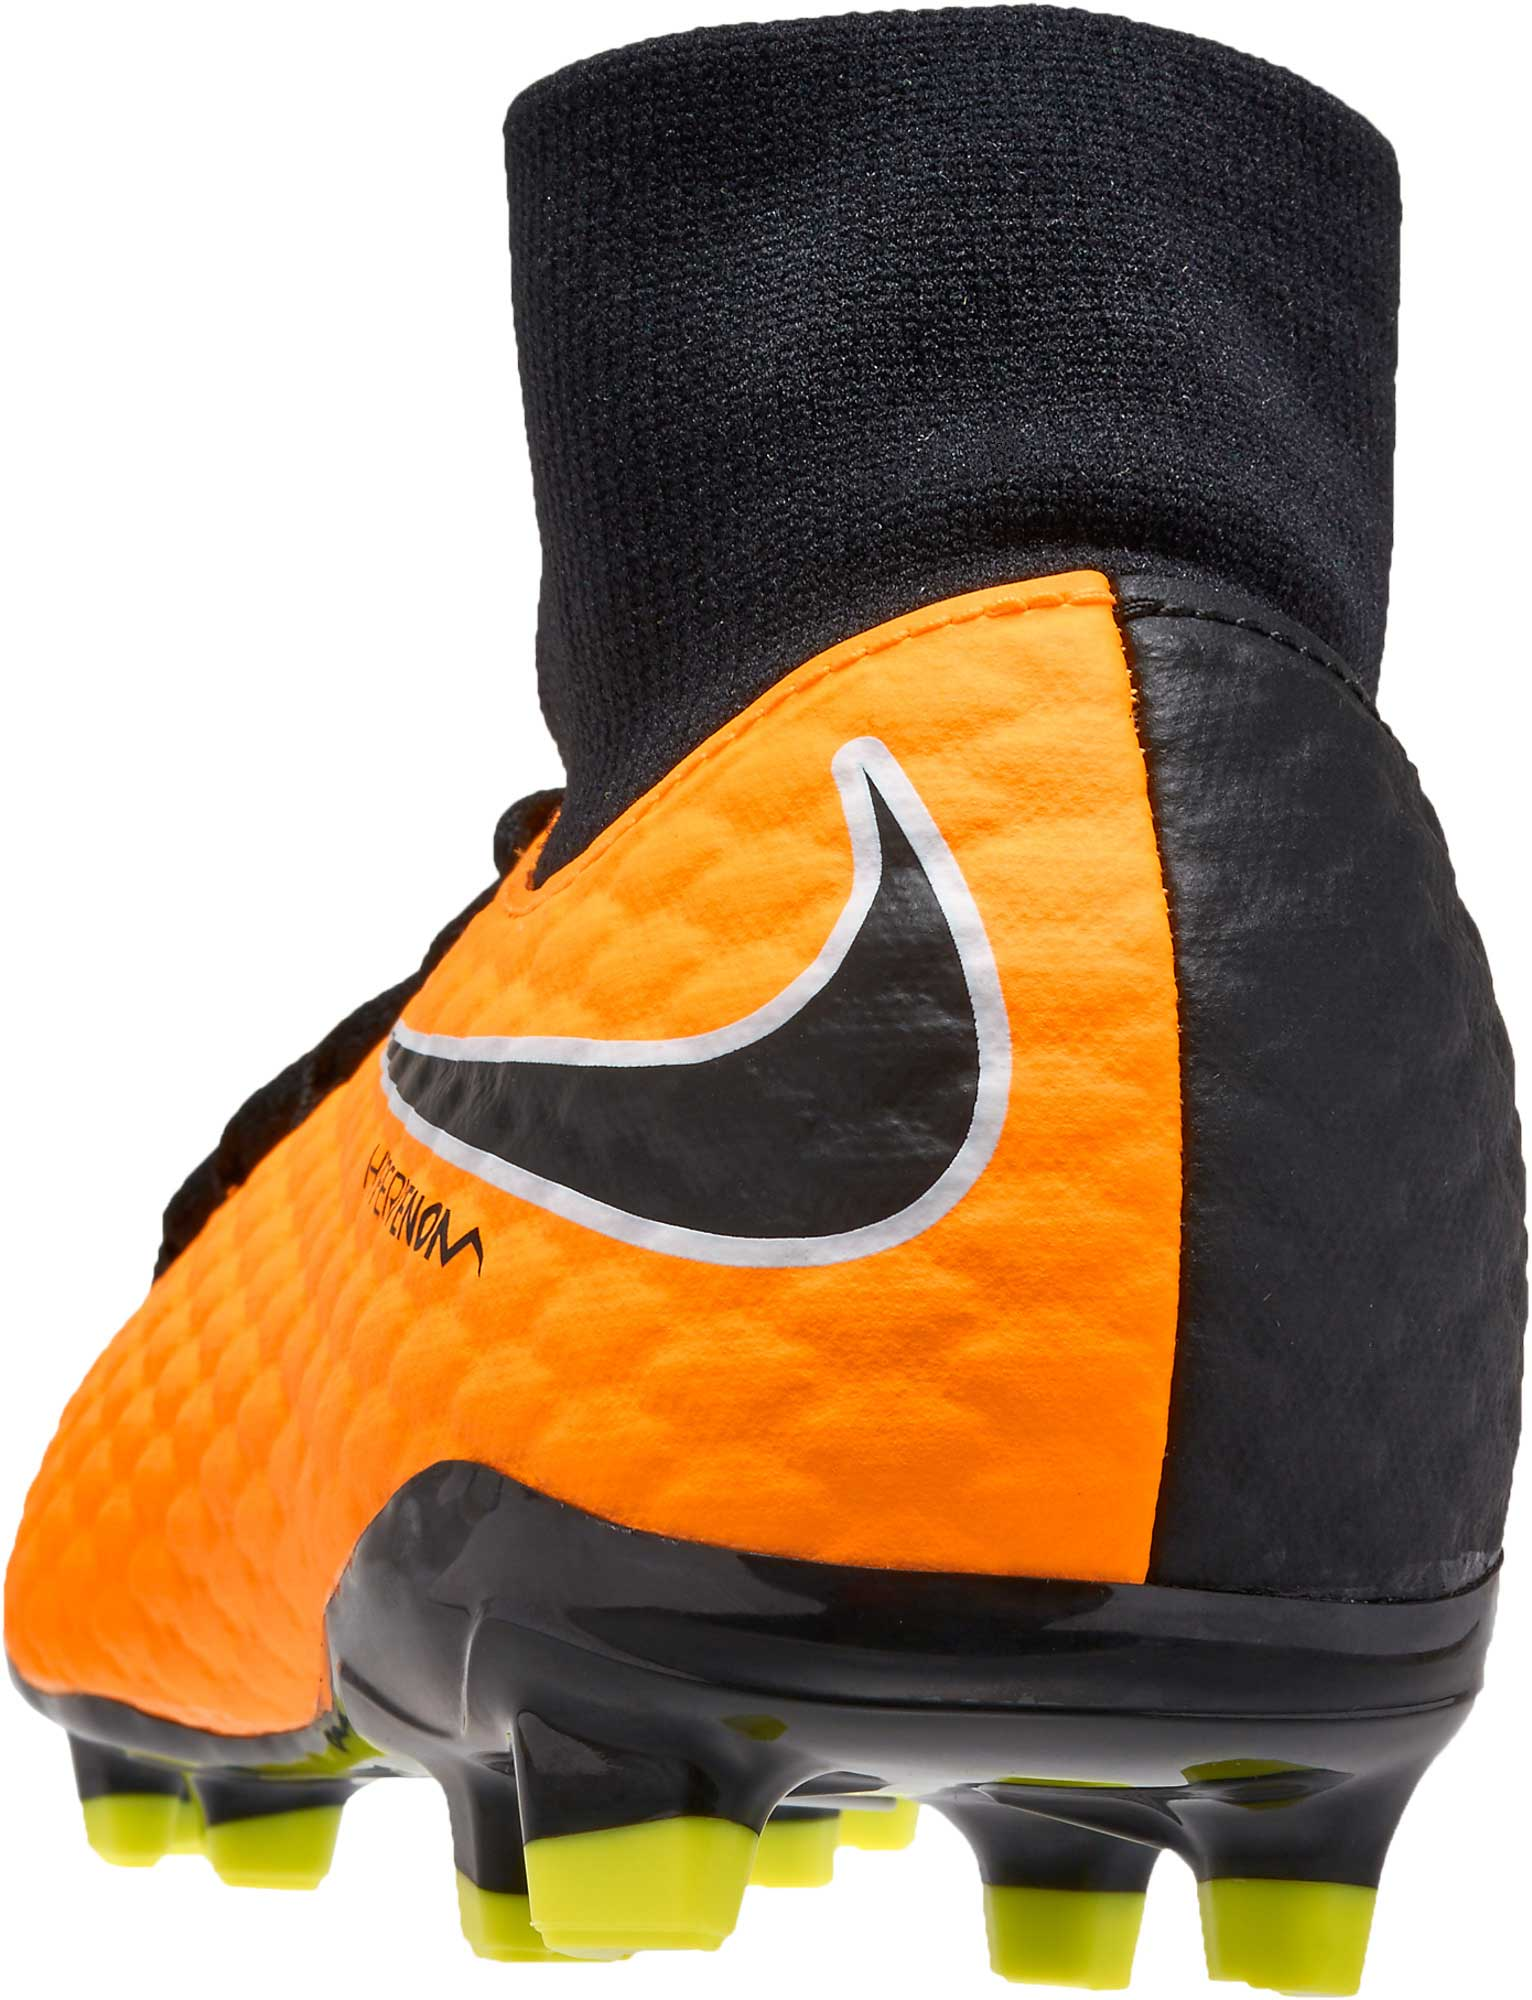 Nike Jr Hypervenom Phelon III Orange DF FG Soccer Cleats Youth 917772-801